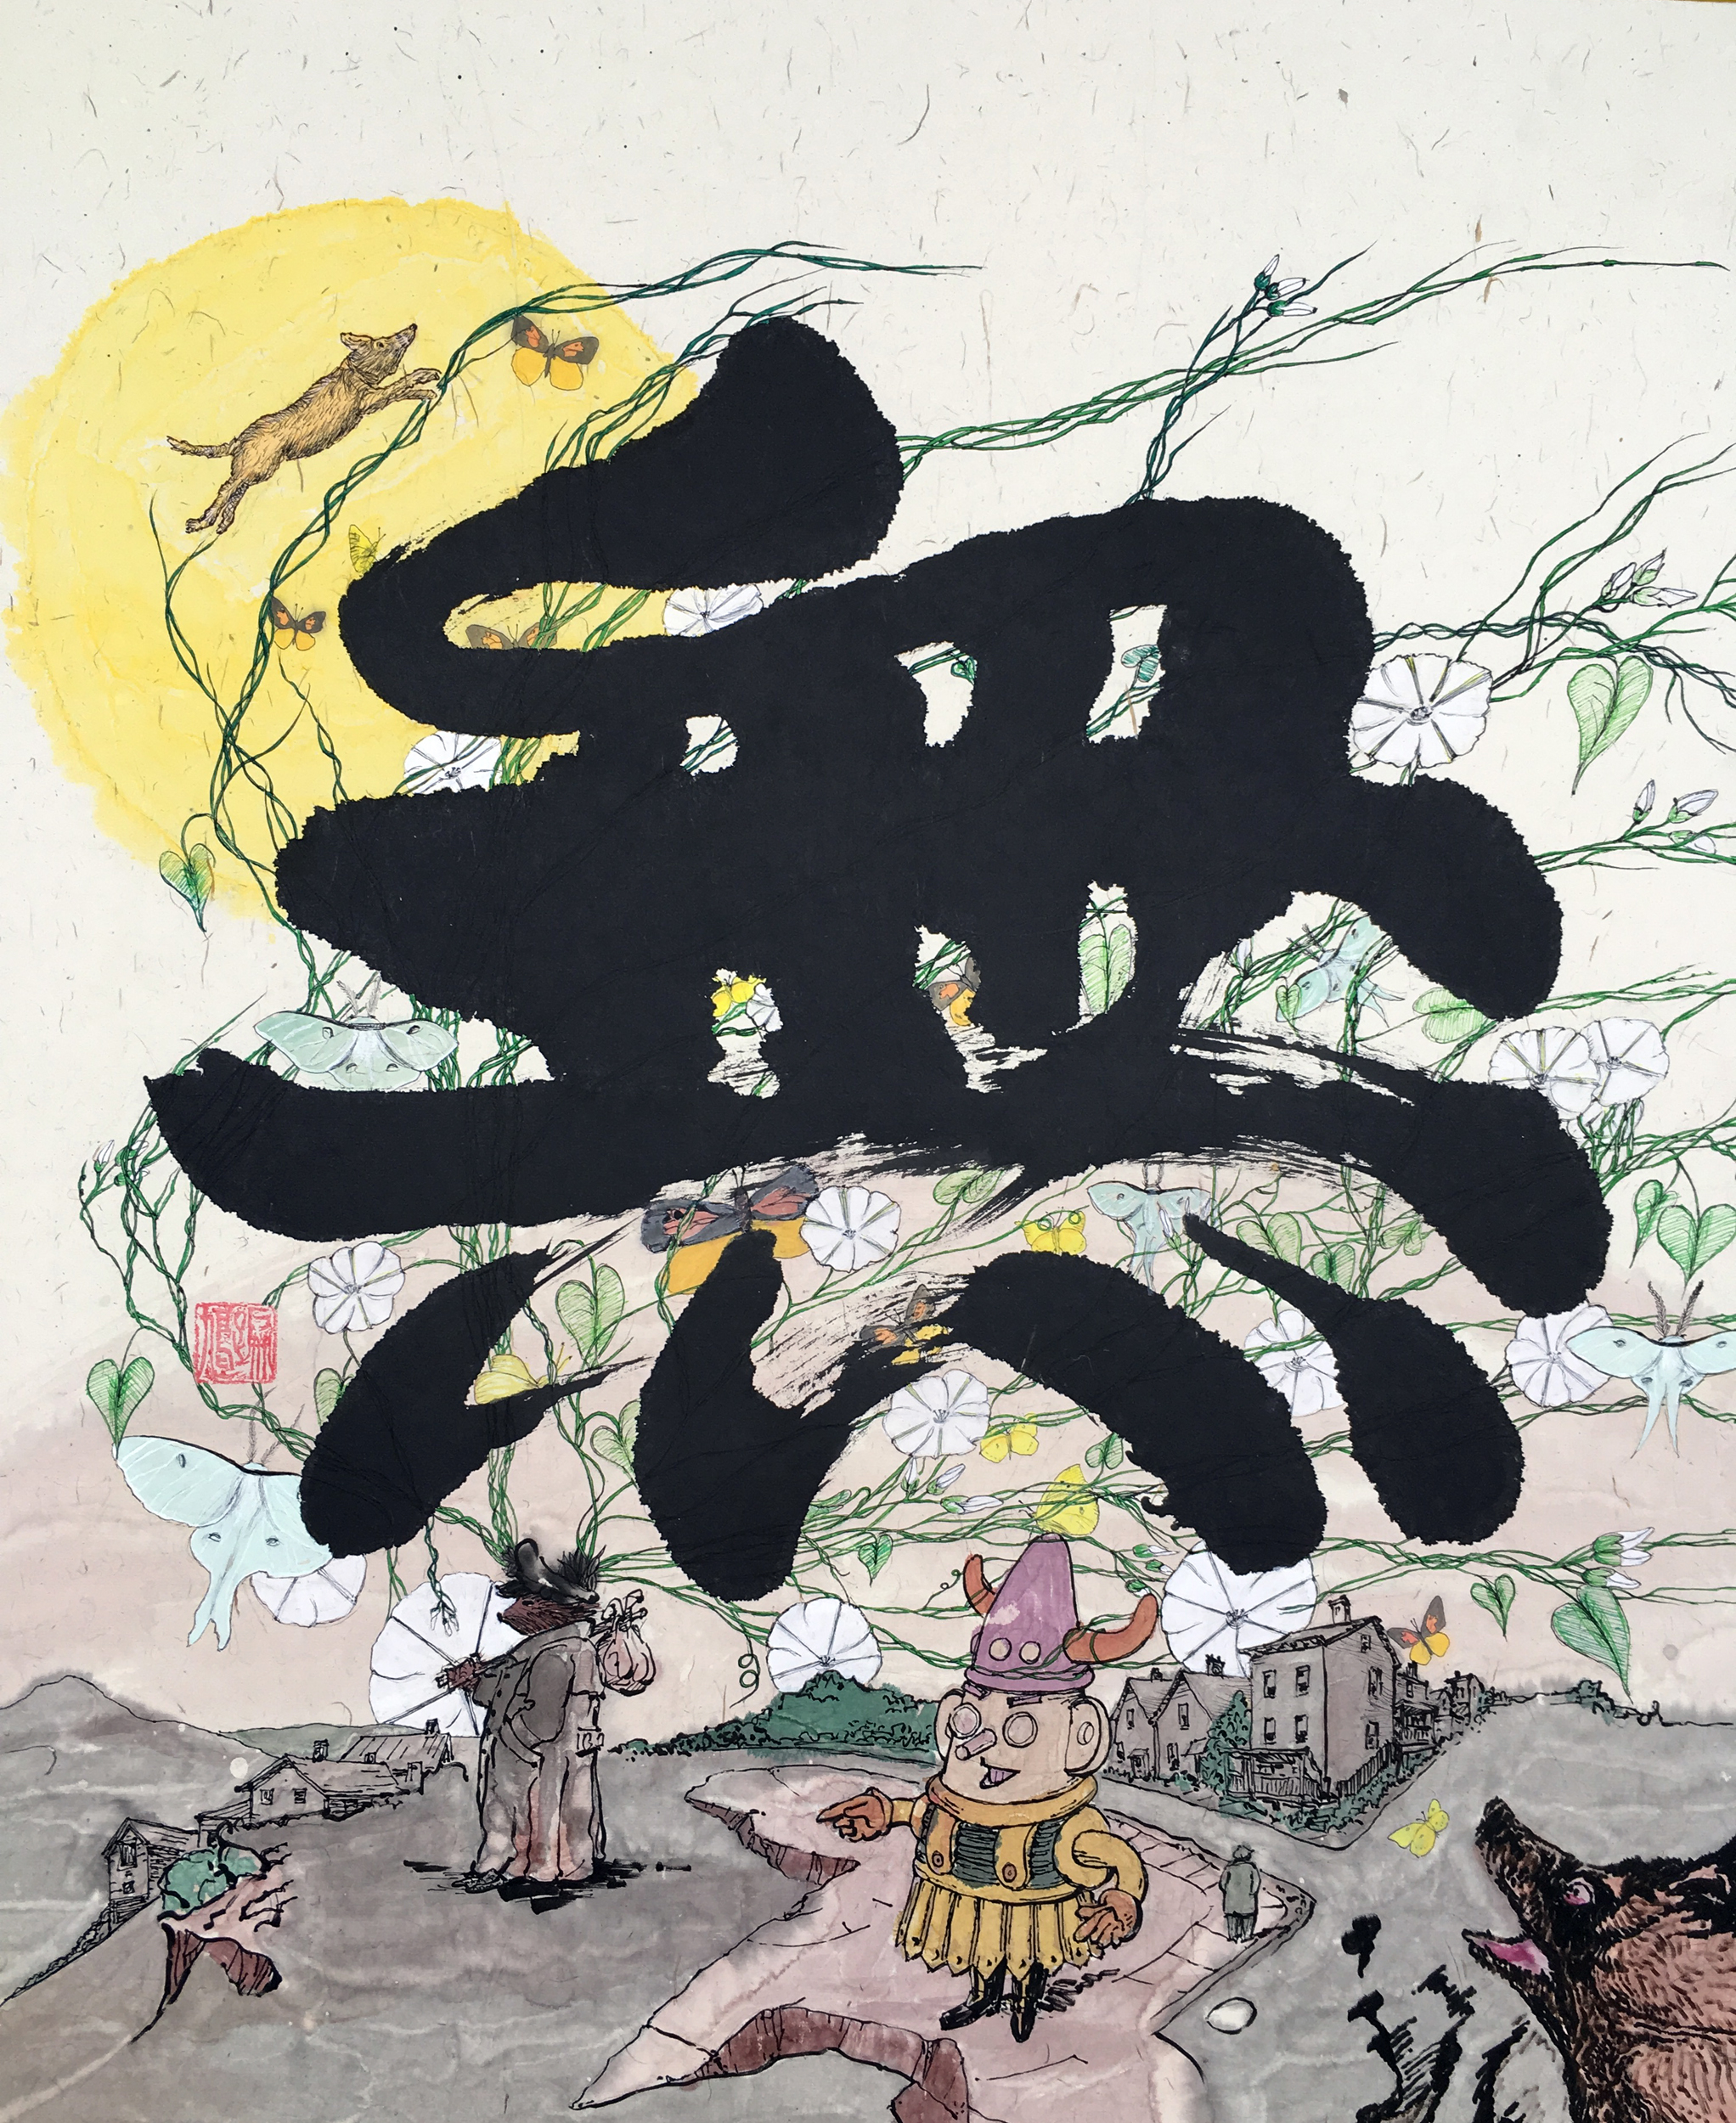 calligraphy and scene